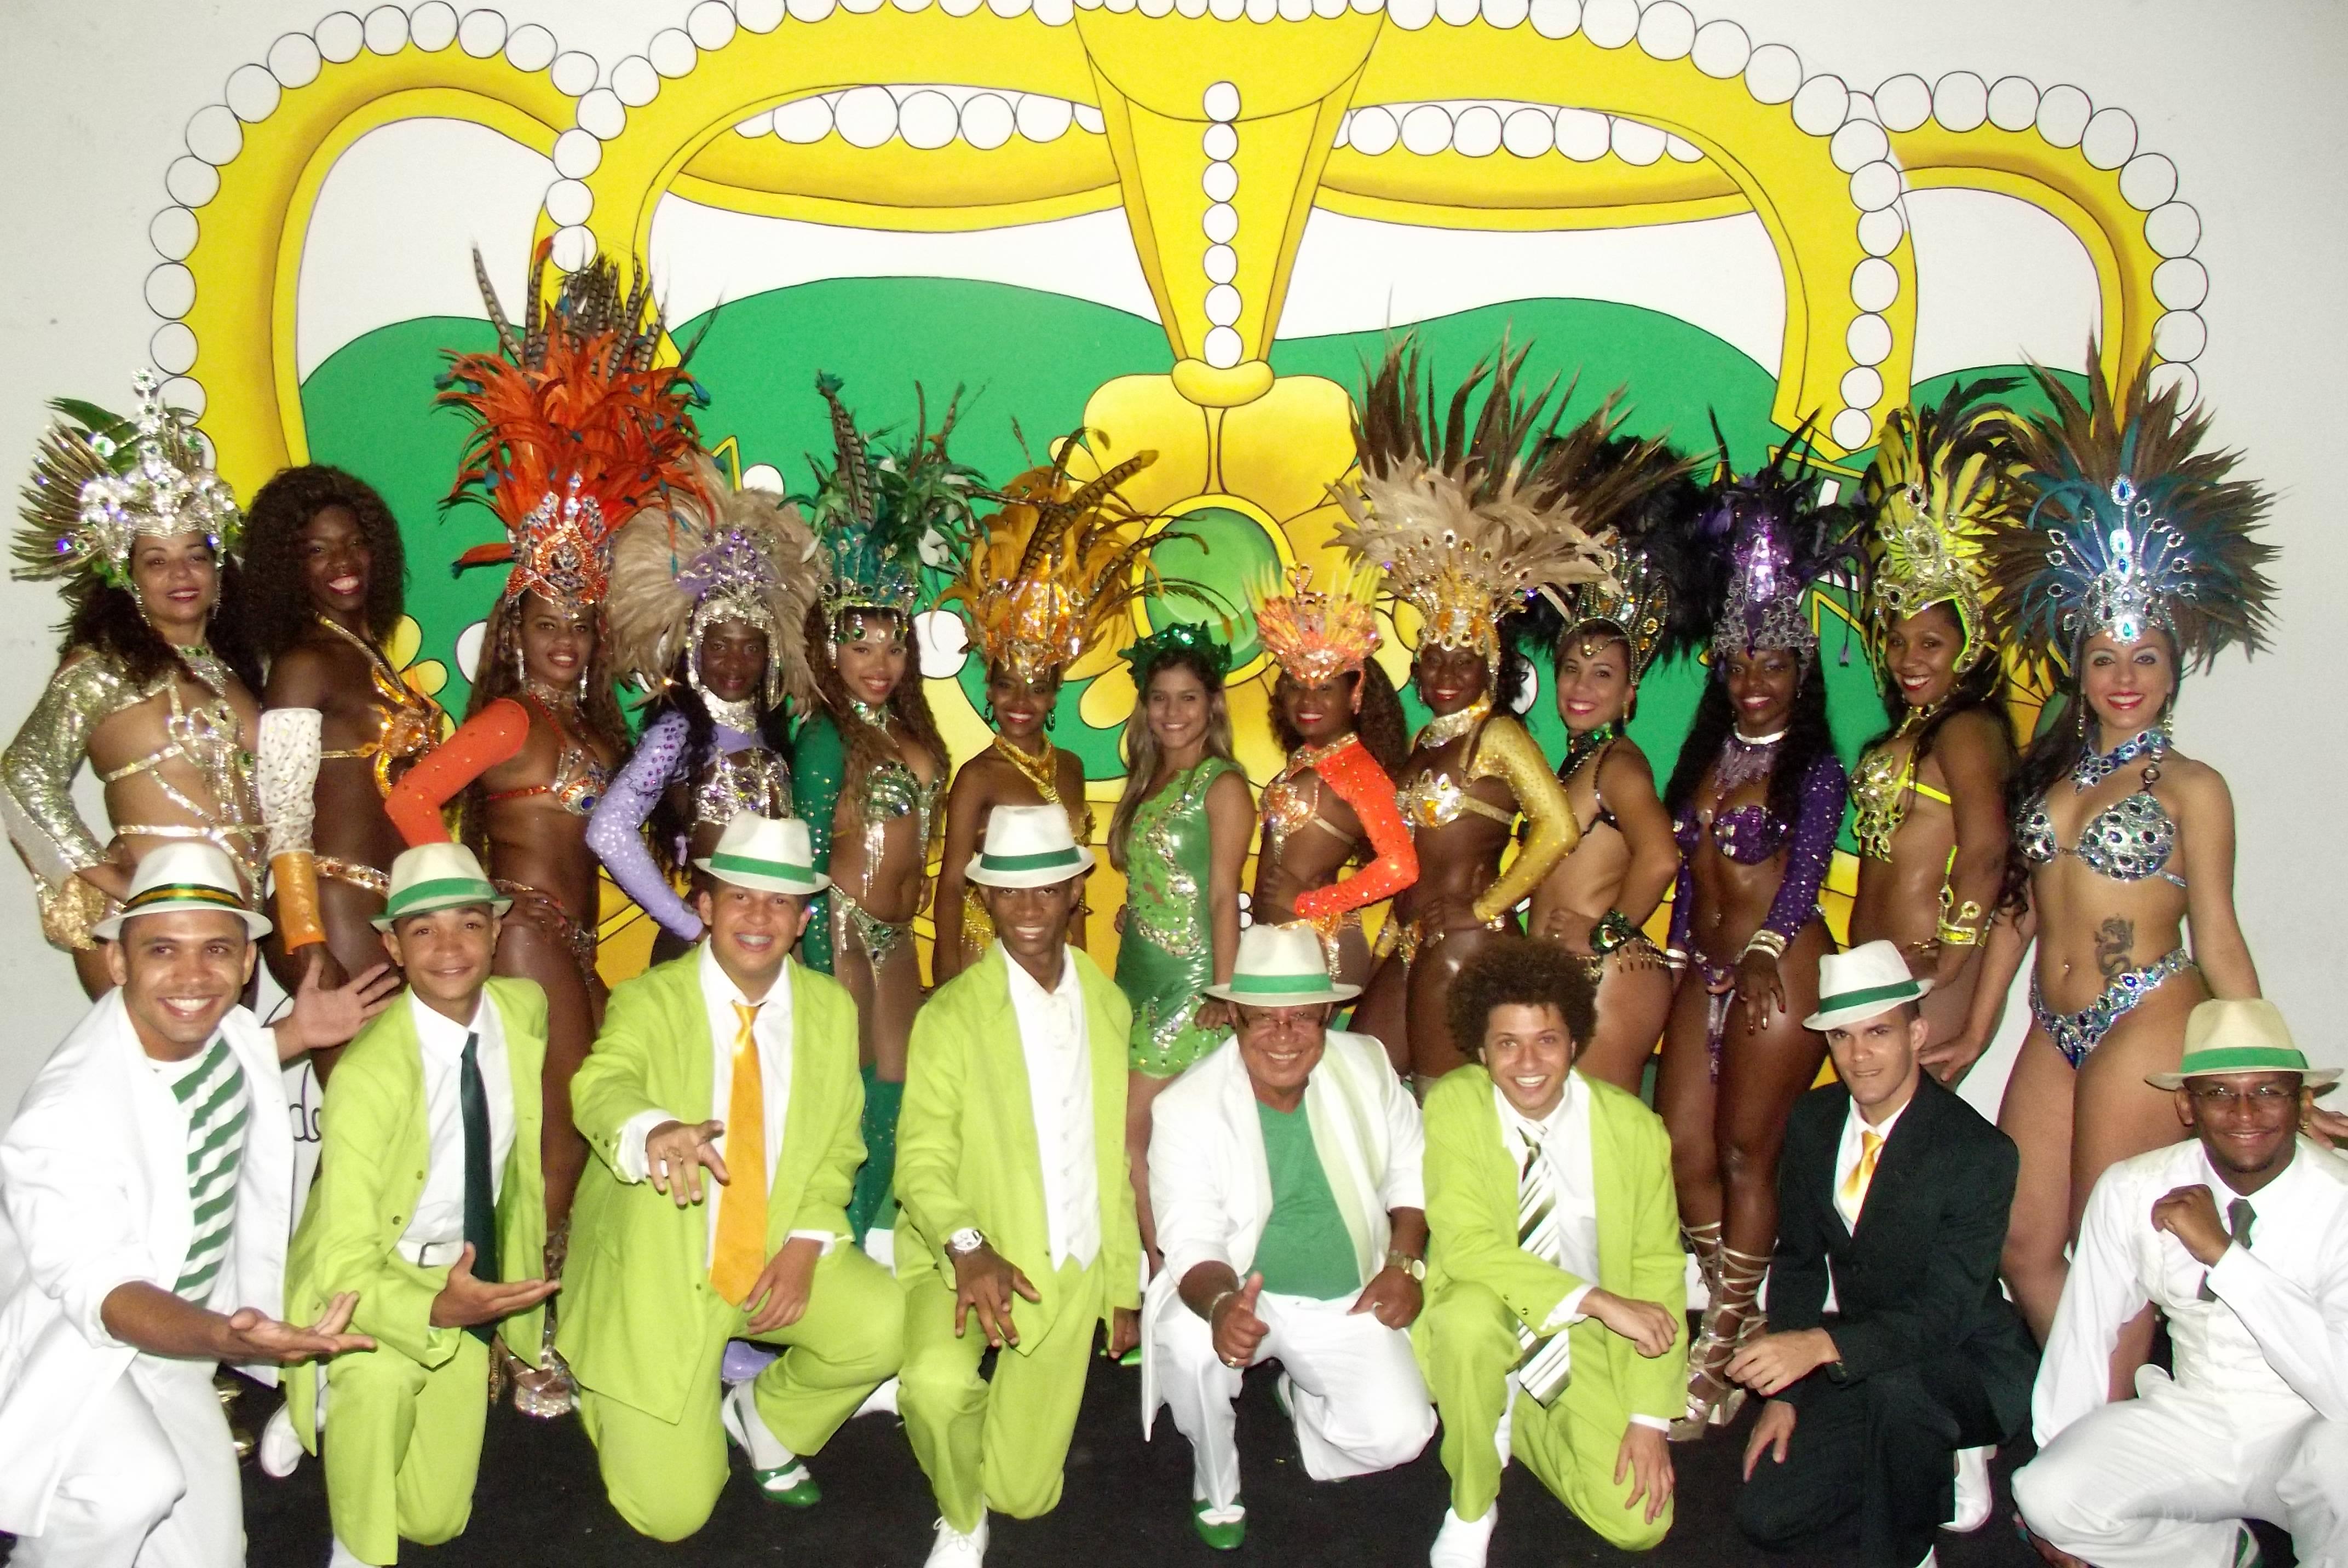 Imperatriz promove encontro de passistas no próximo domingo e Troféu Magníficos premia personalidades do carnaval carioca.